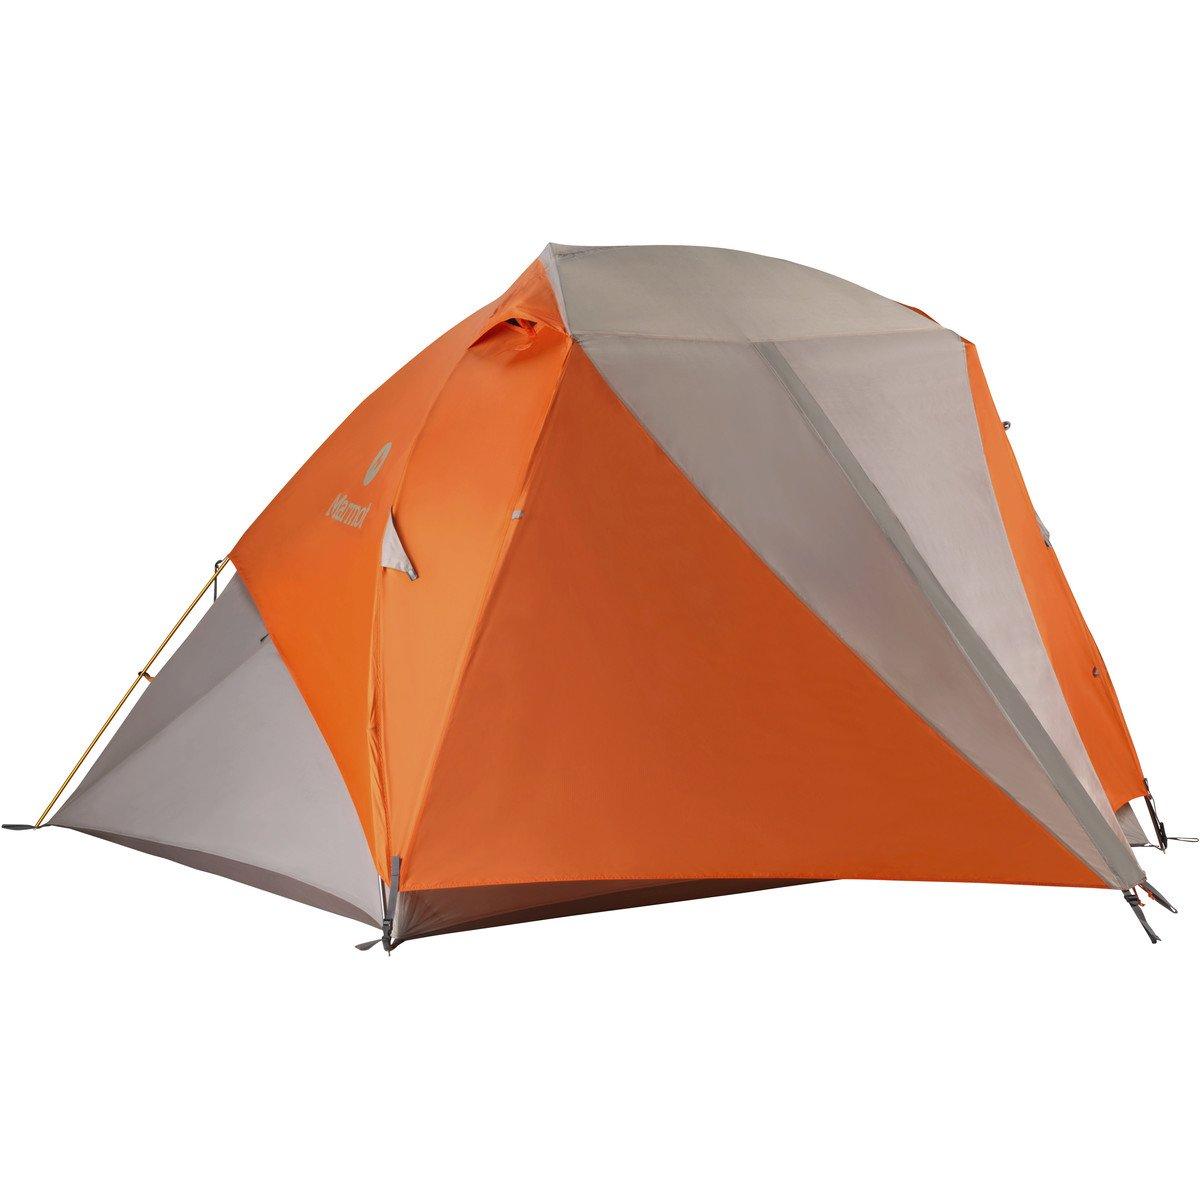 Marmot Argent 4P Tent Blaze/Sandstorm 2016 Kuppelzelt